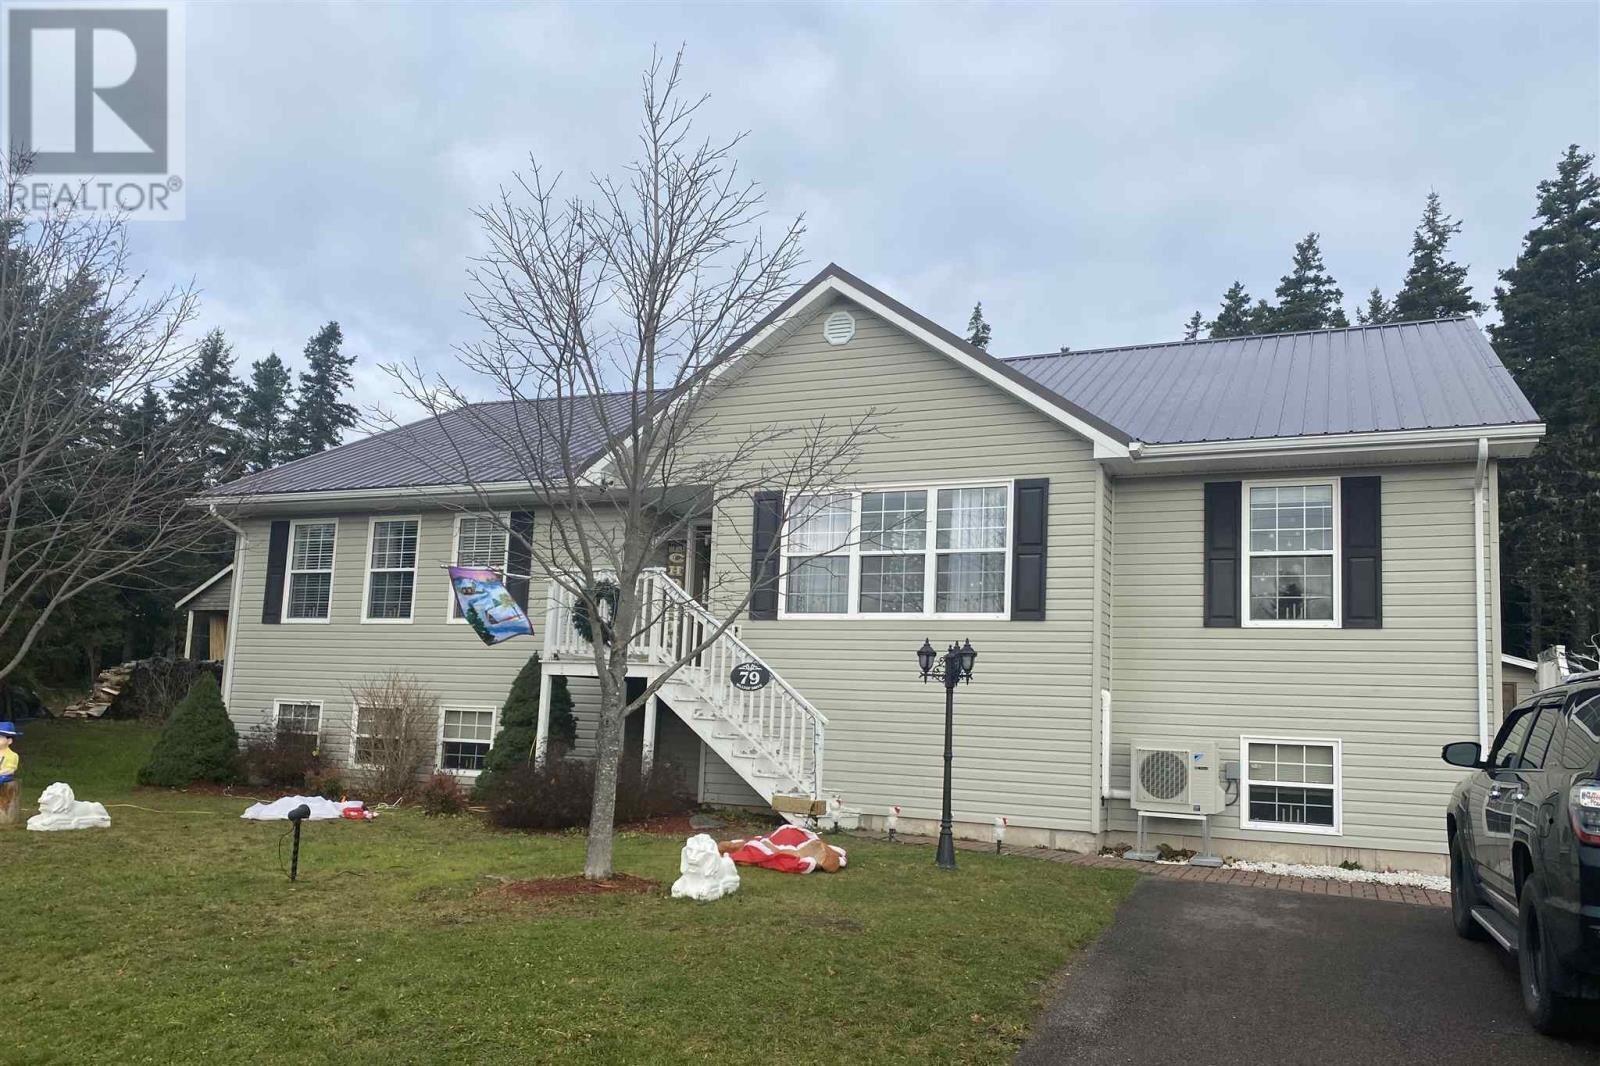 House for sale at 79 Hilltop Dr Port Hastings Nova Scotia - MLS: 202100636